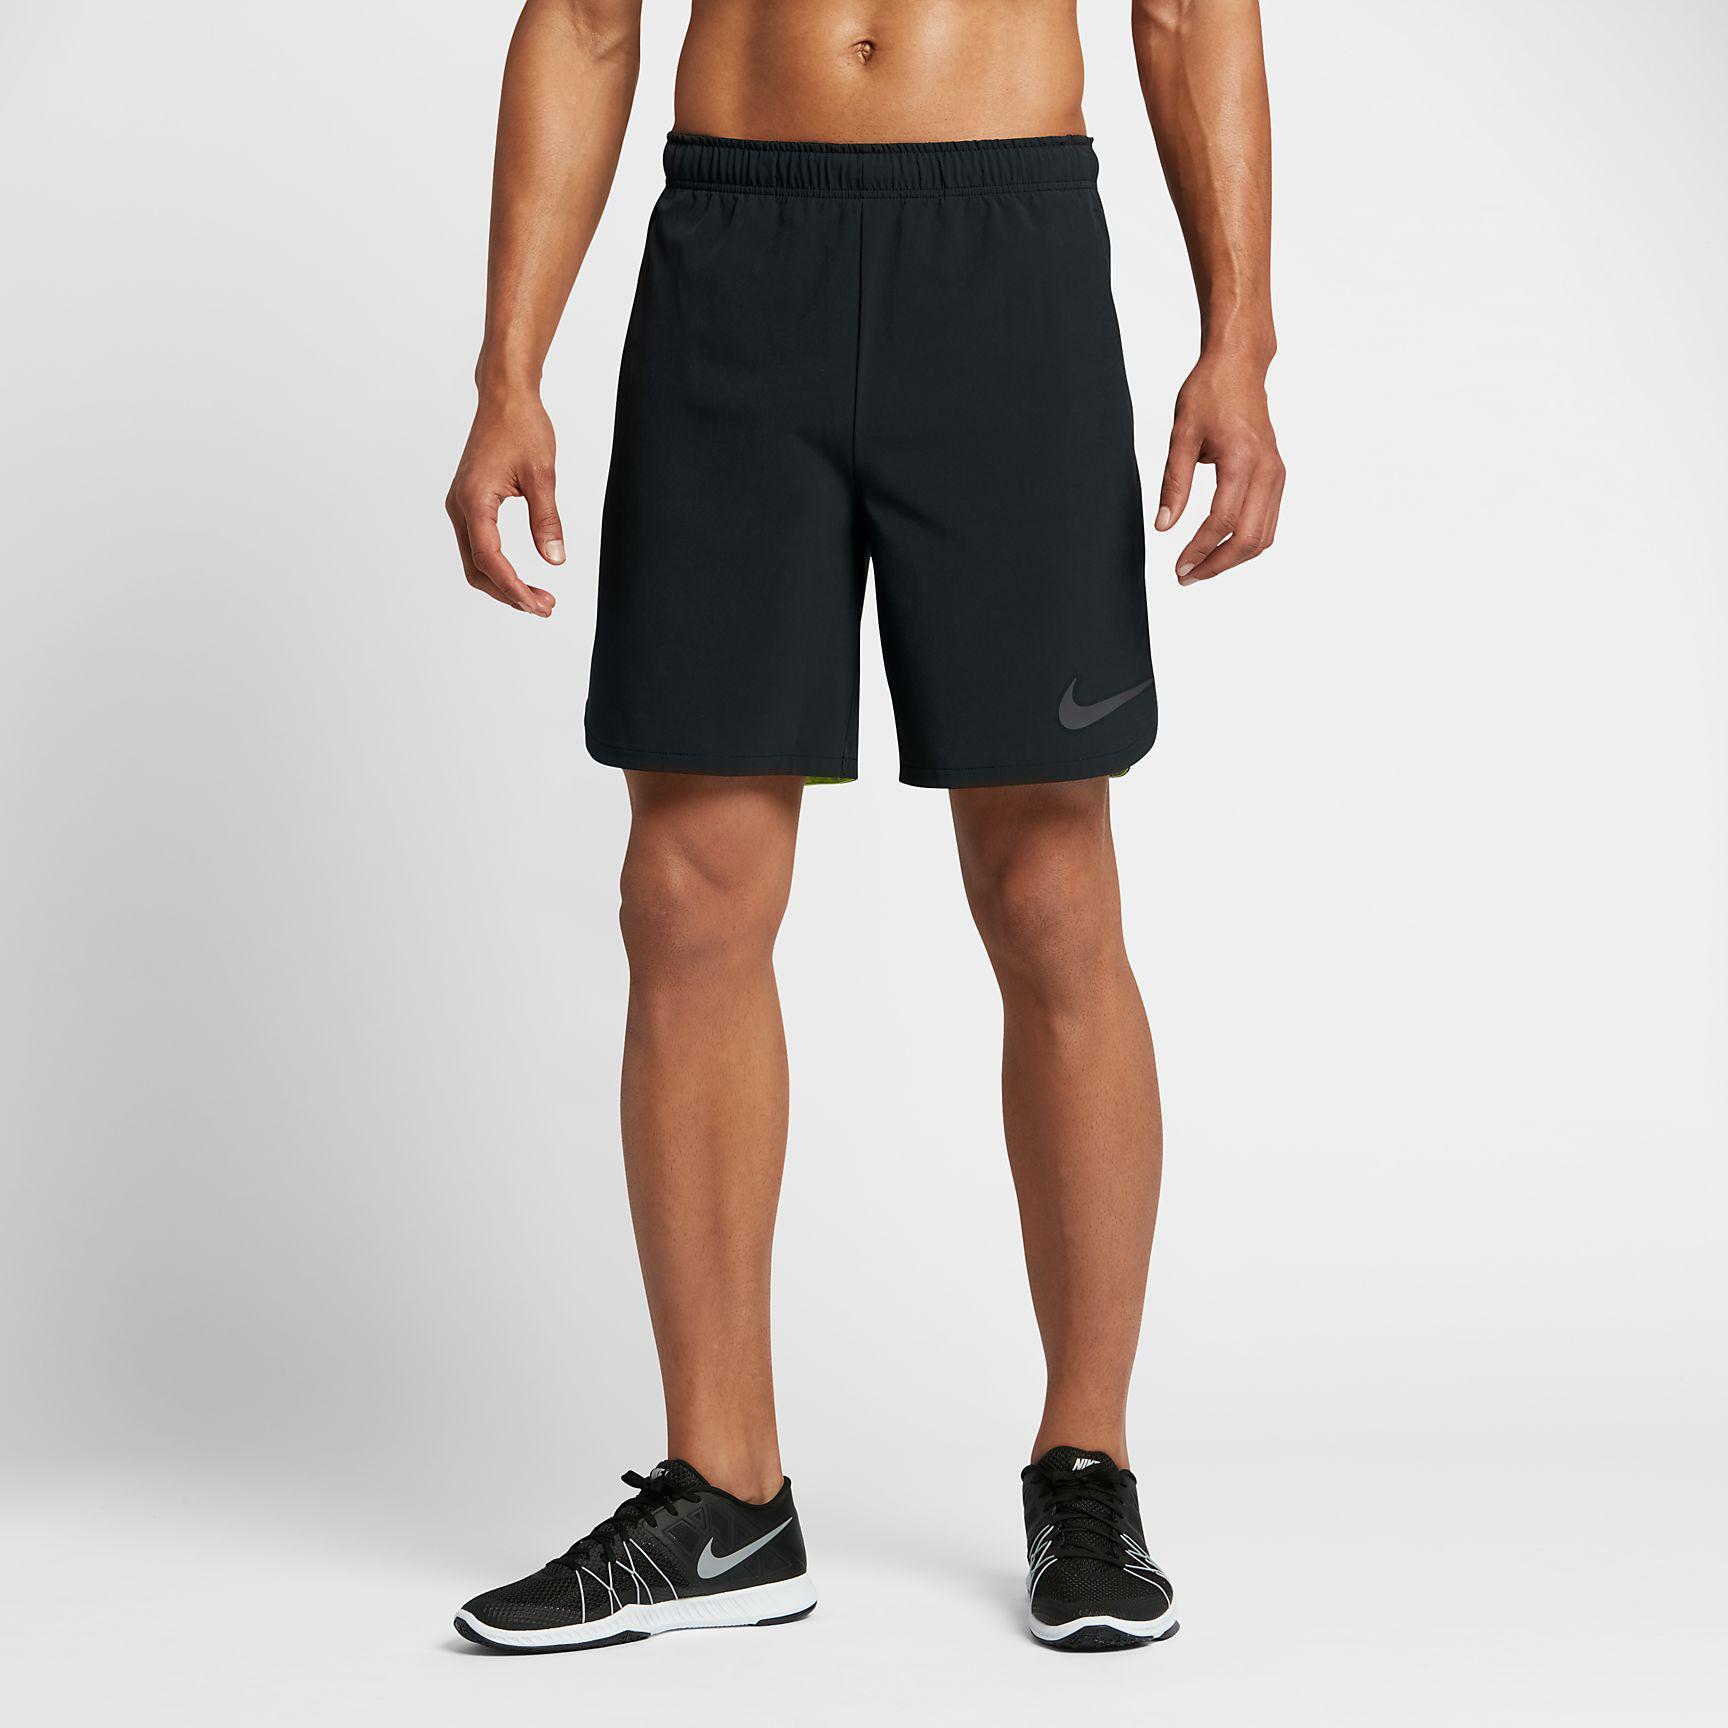 35297b2a294 Nike Mens Flex Training Shorts - Black Dust - Tennisnuts.com